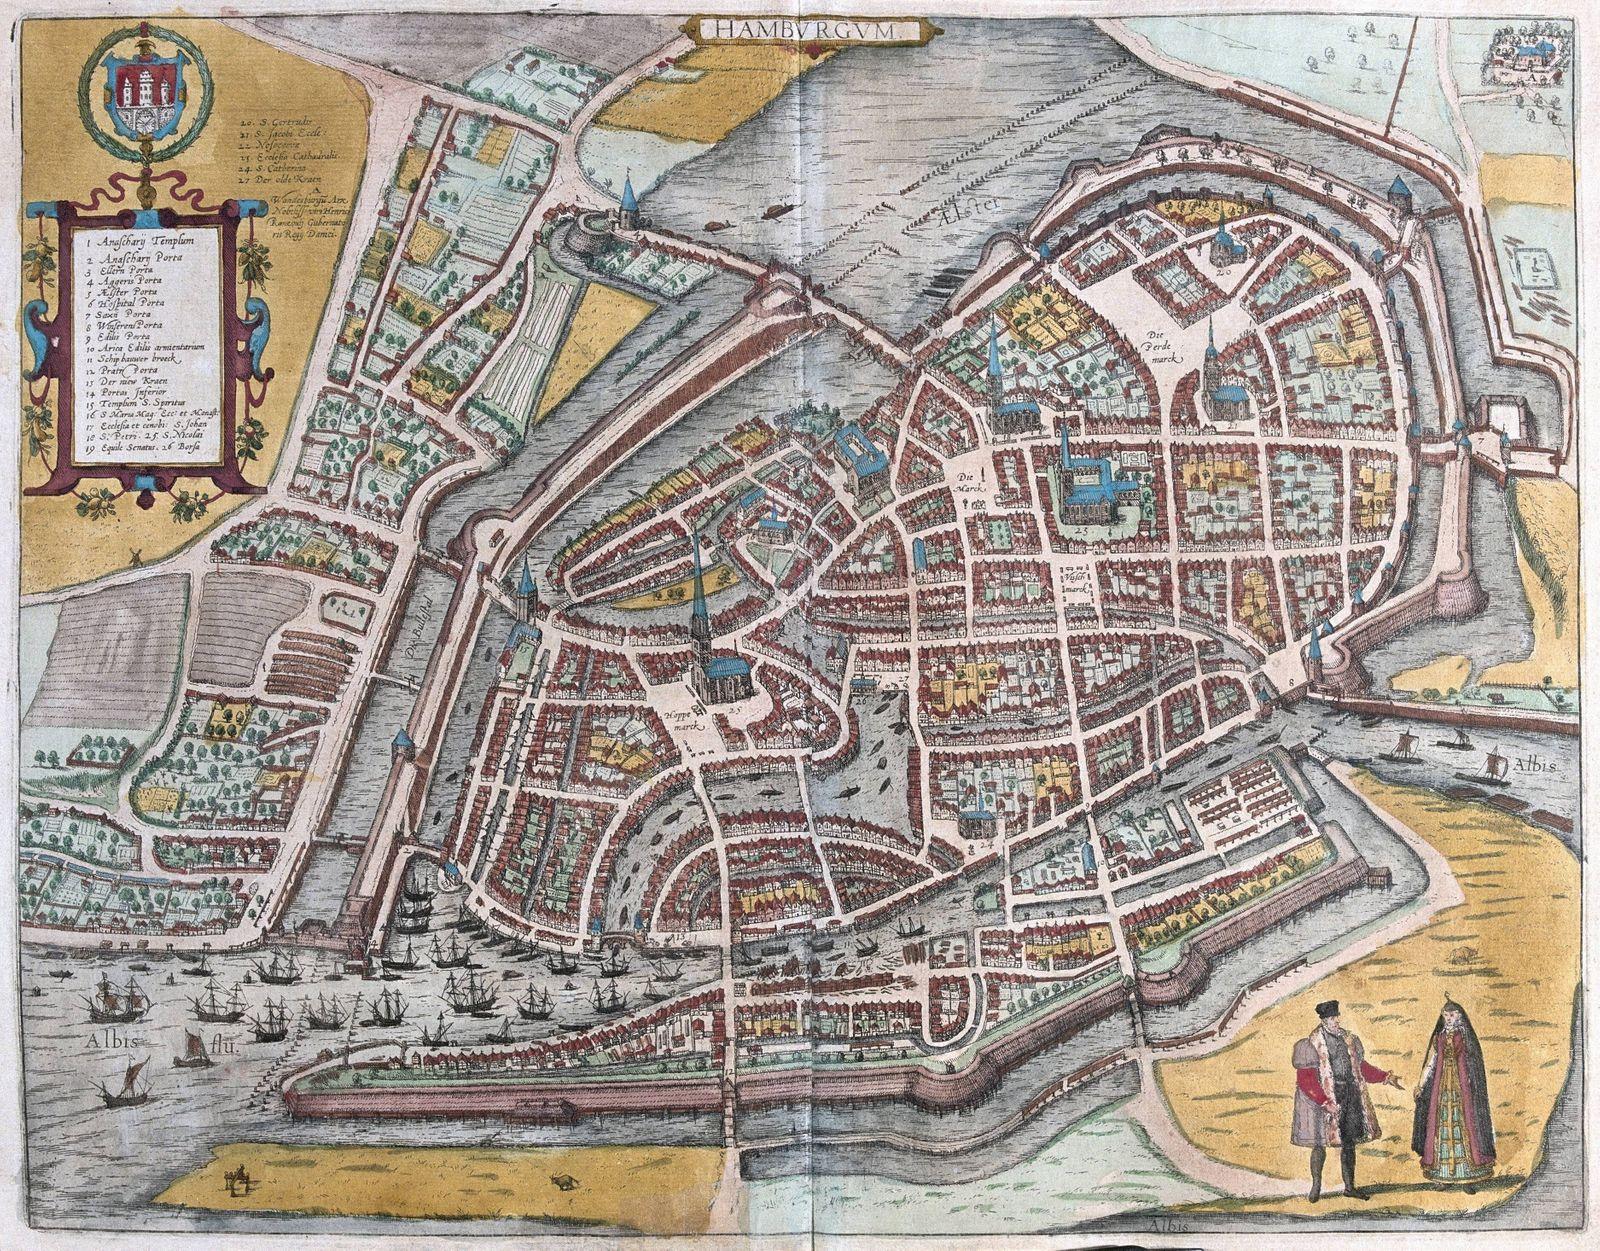 Hamburgum Hamburg Germany in Civitates Orbis Terrarum published in six parts between 1572 and 1